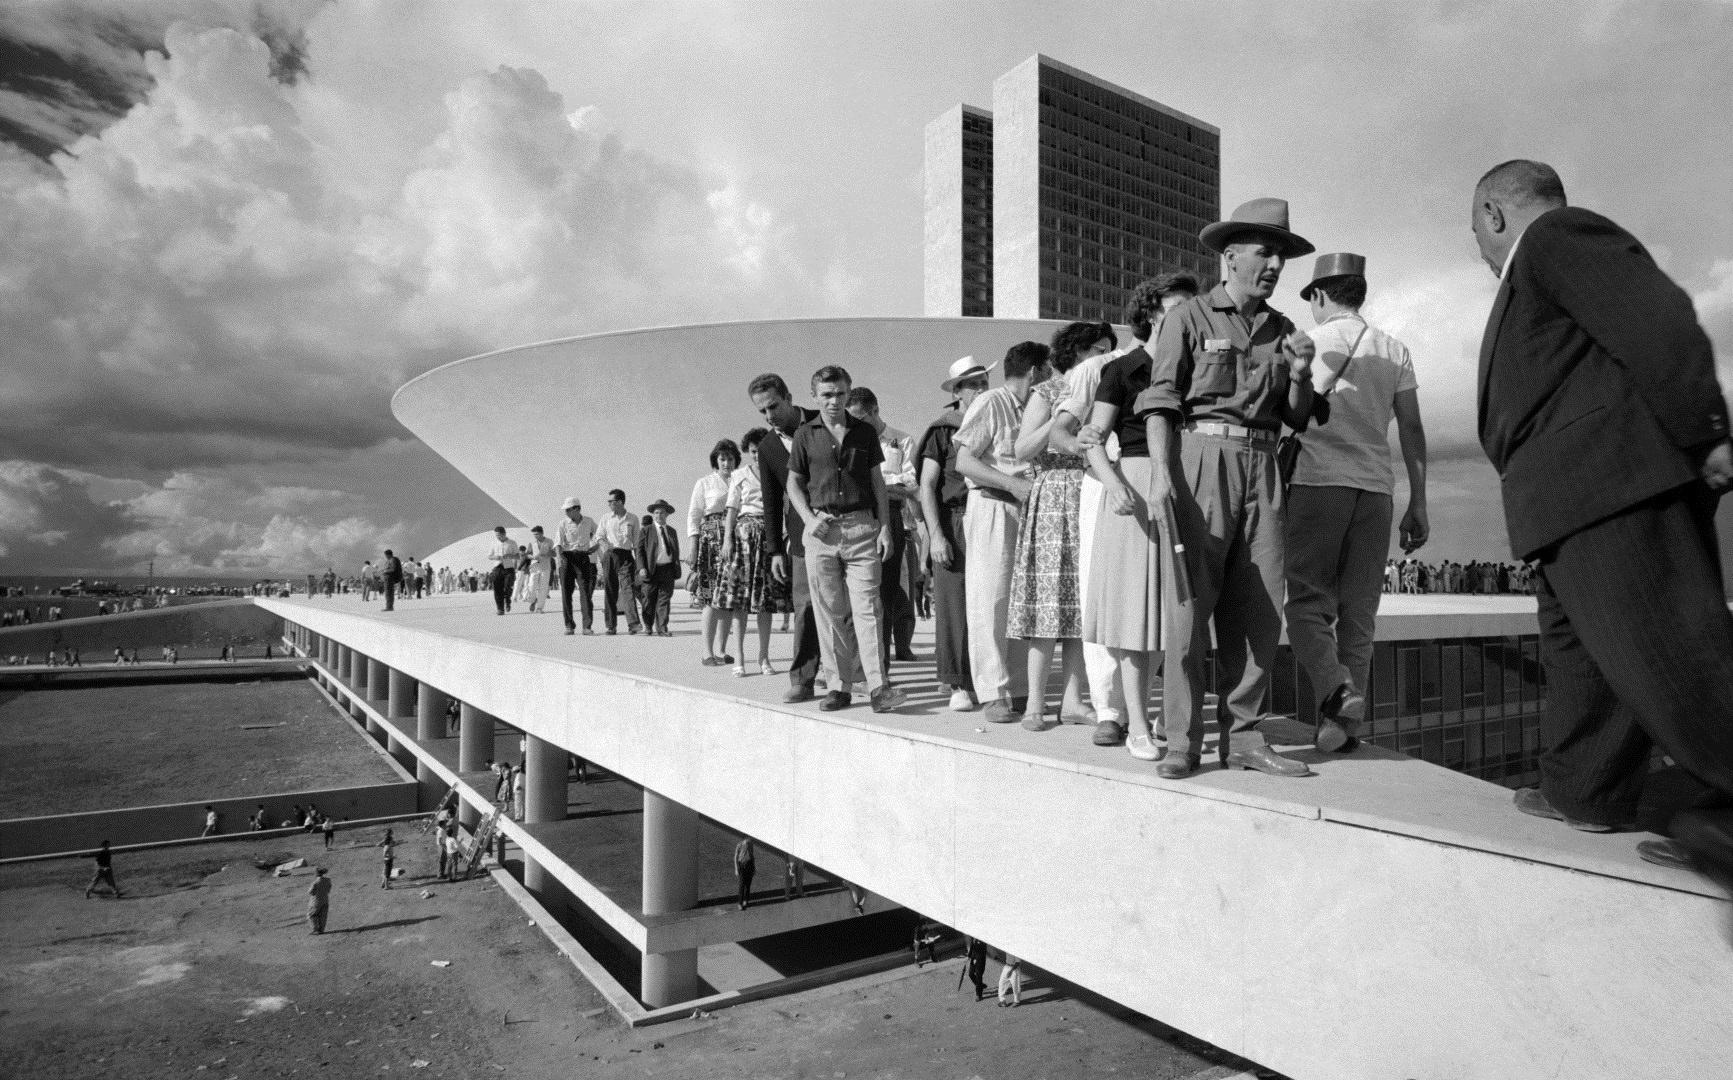 Thomaz Farkas: A város avatásának napja, Brazíliaváros, 1960. április 21. | Inauguration day, Brasilia, April 21, 1960 © Thomaz Farkas Estate/Instituto Moreira